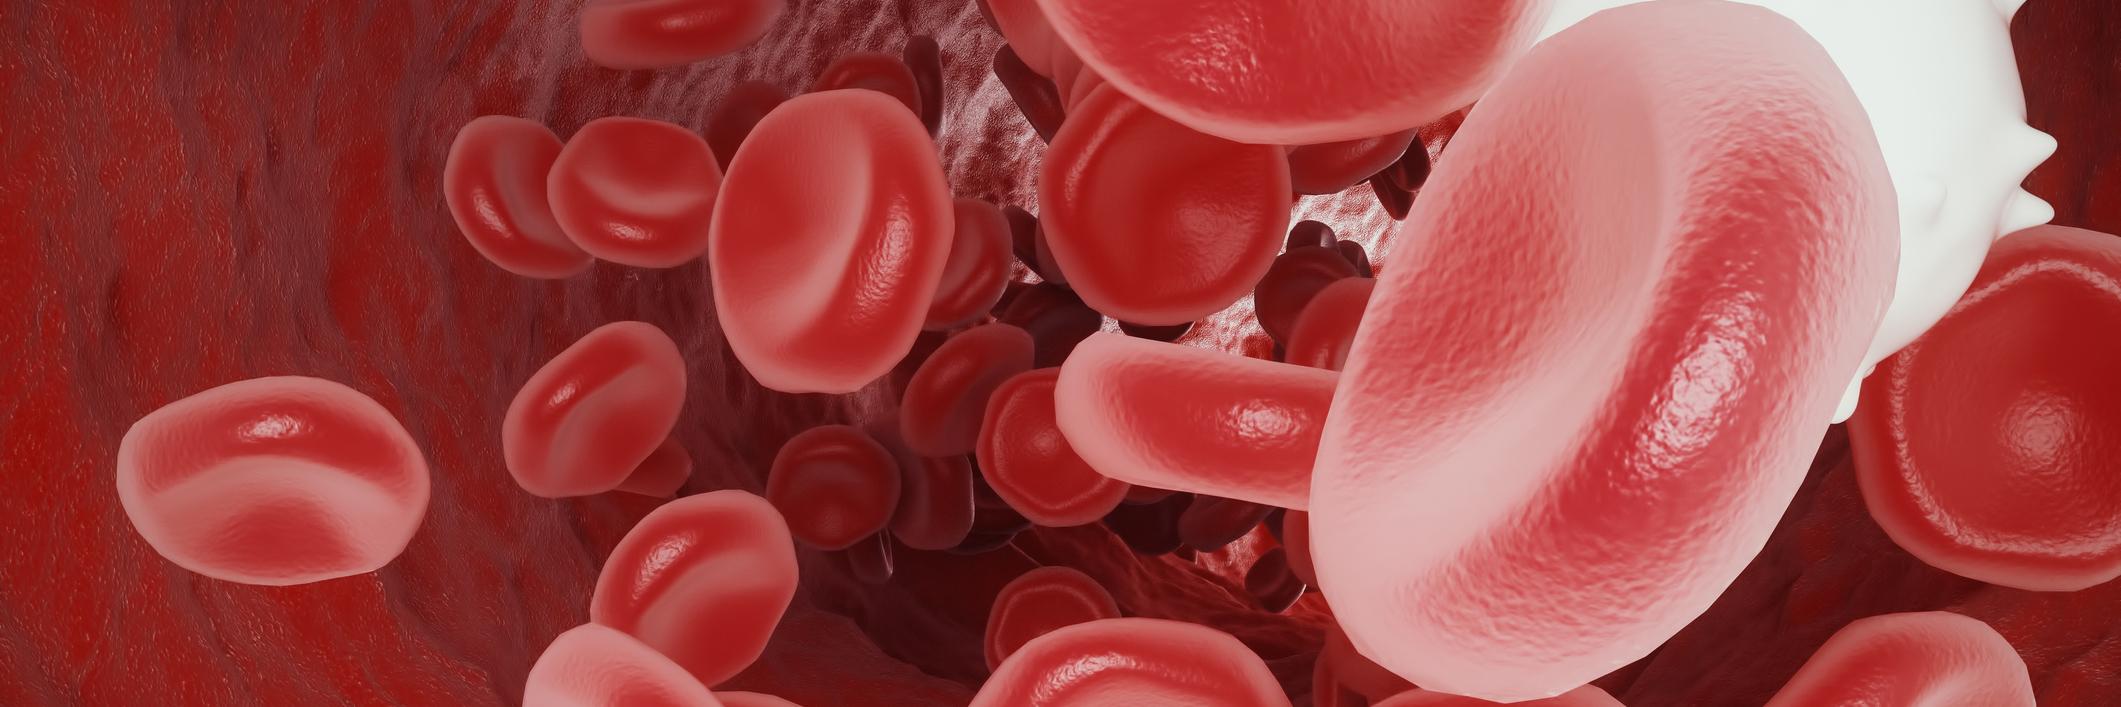 Summary -> White Blood Cells Leukocytes In Urine But No Infection